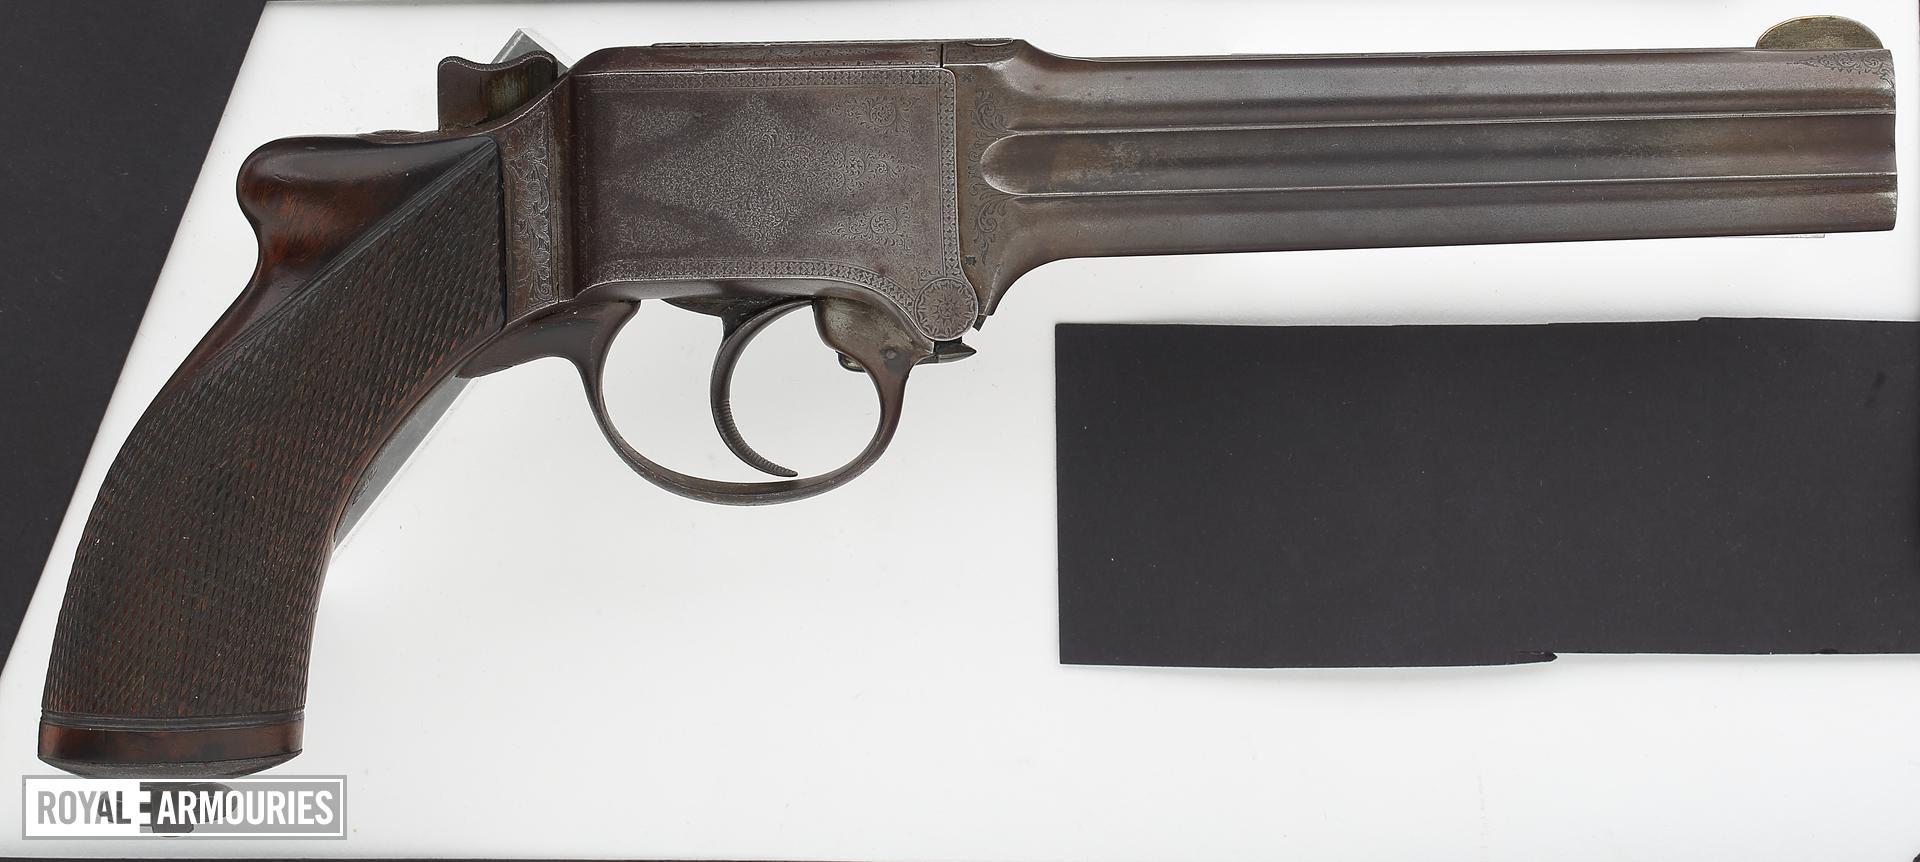 Centrefire four-barrelled pistol - Martin-Marres-Braendlin Mitrailleuse